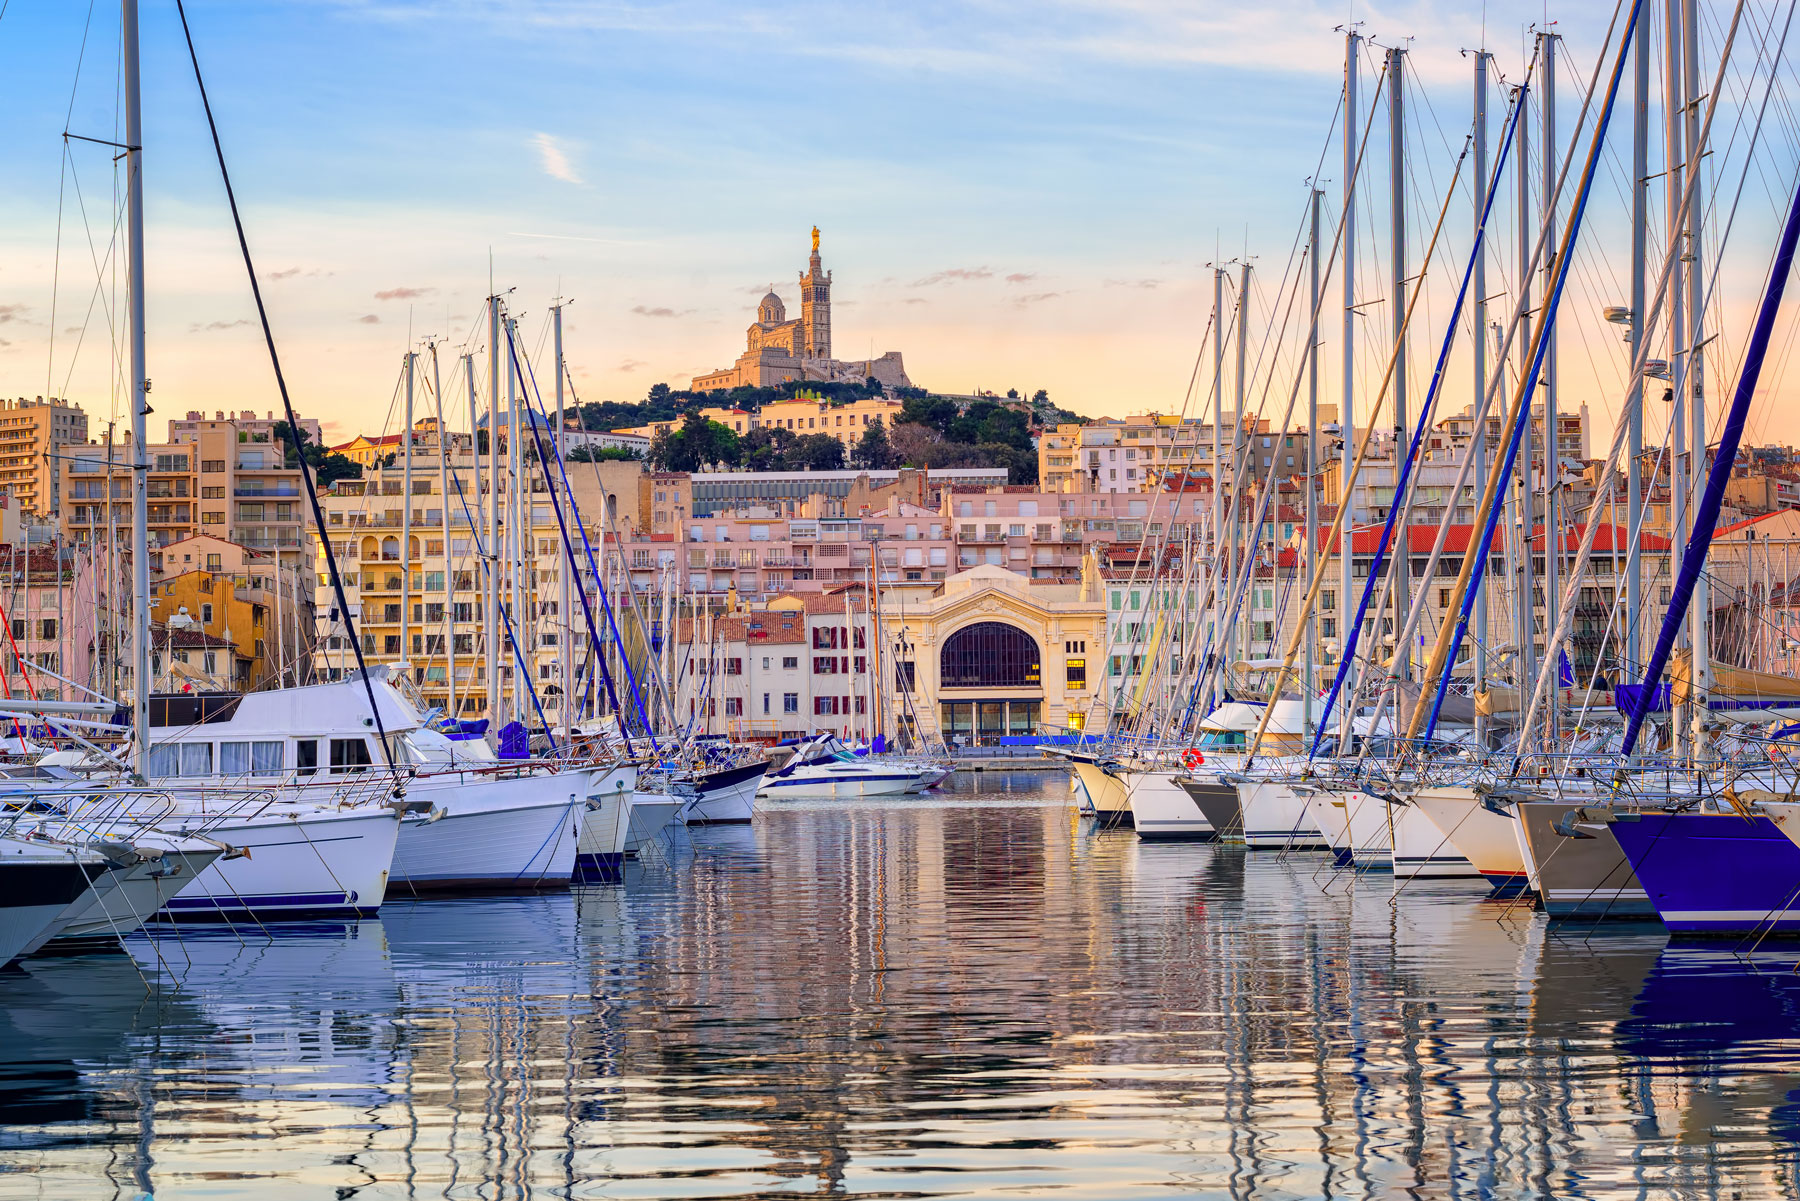 vieux port in Marseille, France